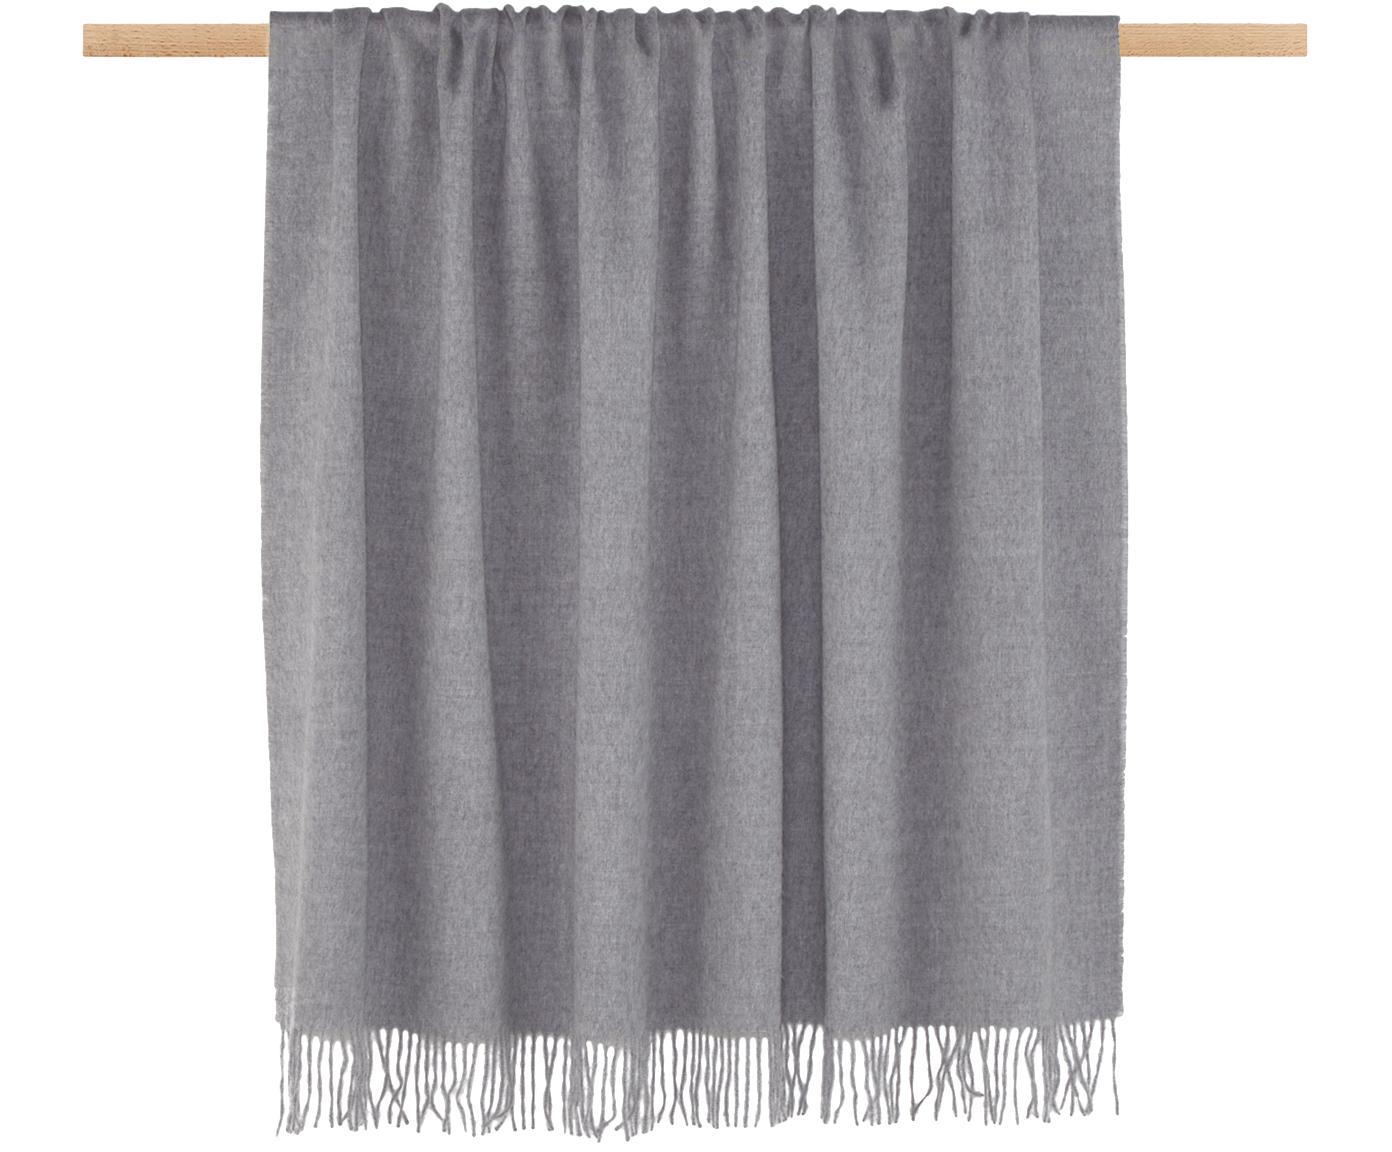 Babyalpaka-Plaid Luxury, Grau, 130 x 200 cm